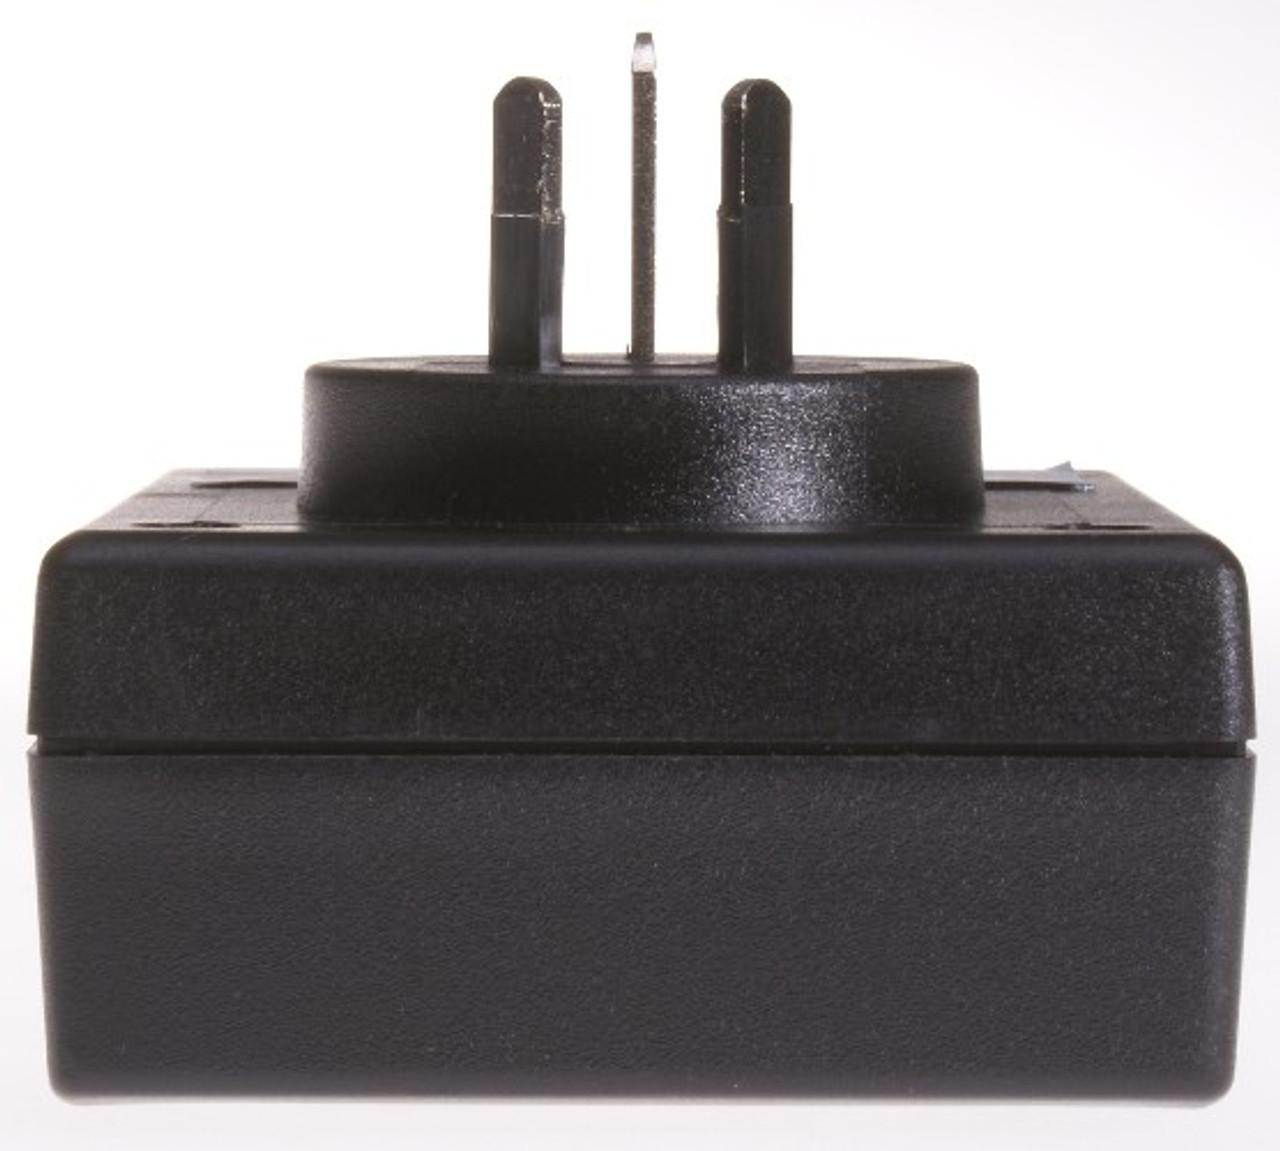 ACR PowerWatch PWV-002-A pins